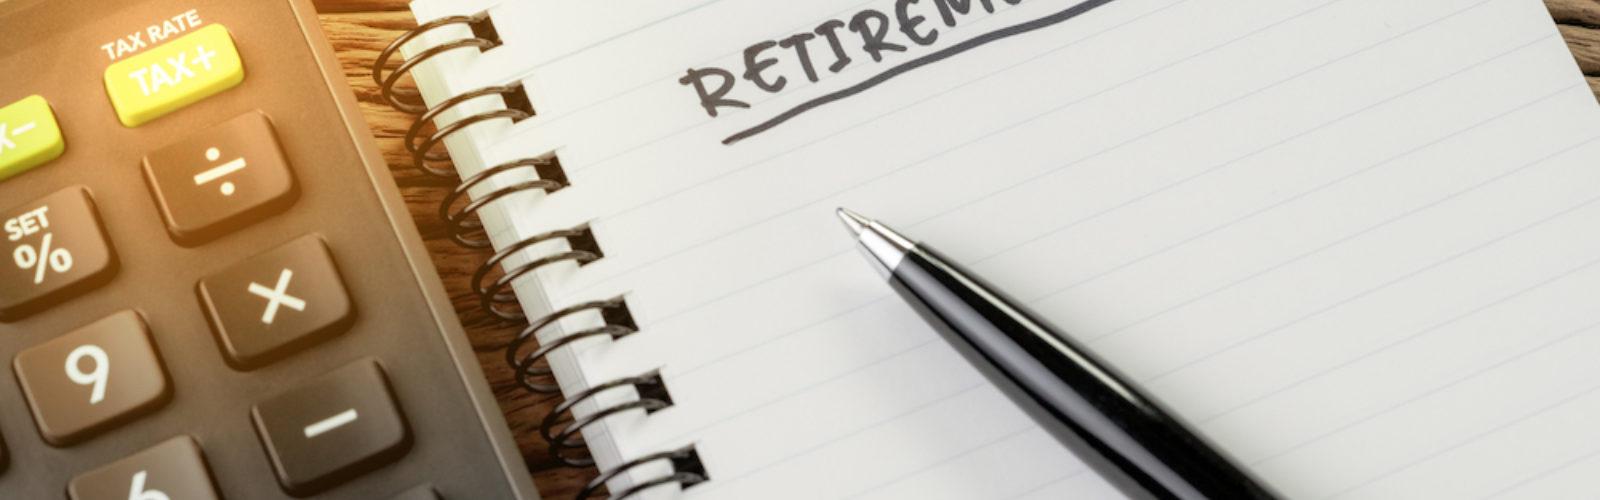 bigstock-Retirement-Plan-Concept-Calcu-299445301_web.jpg